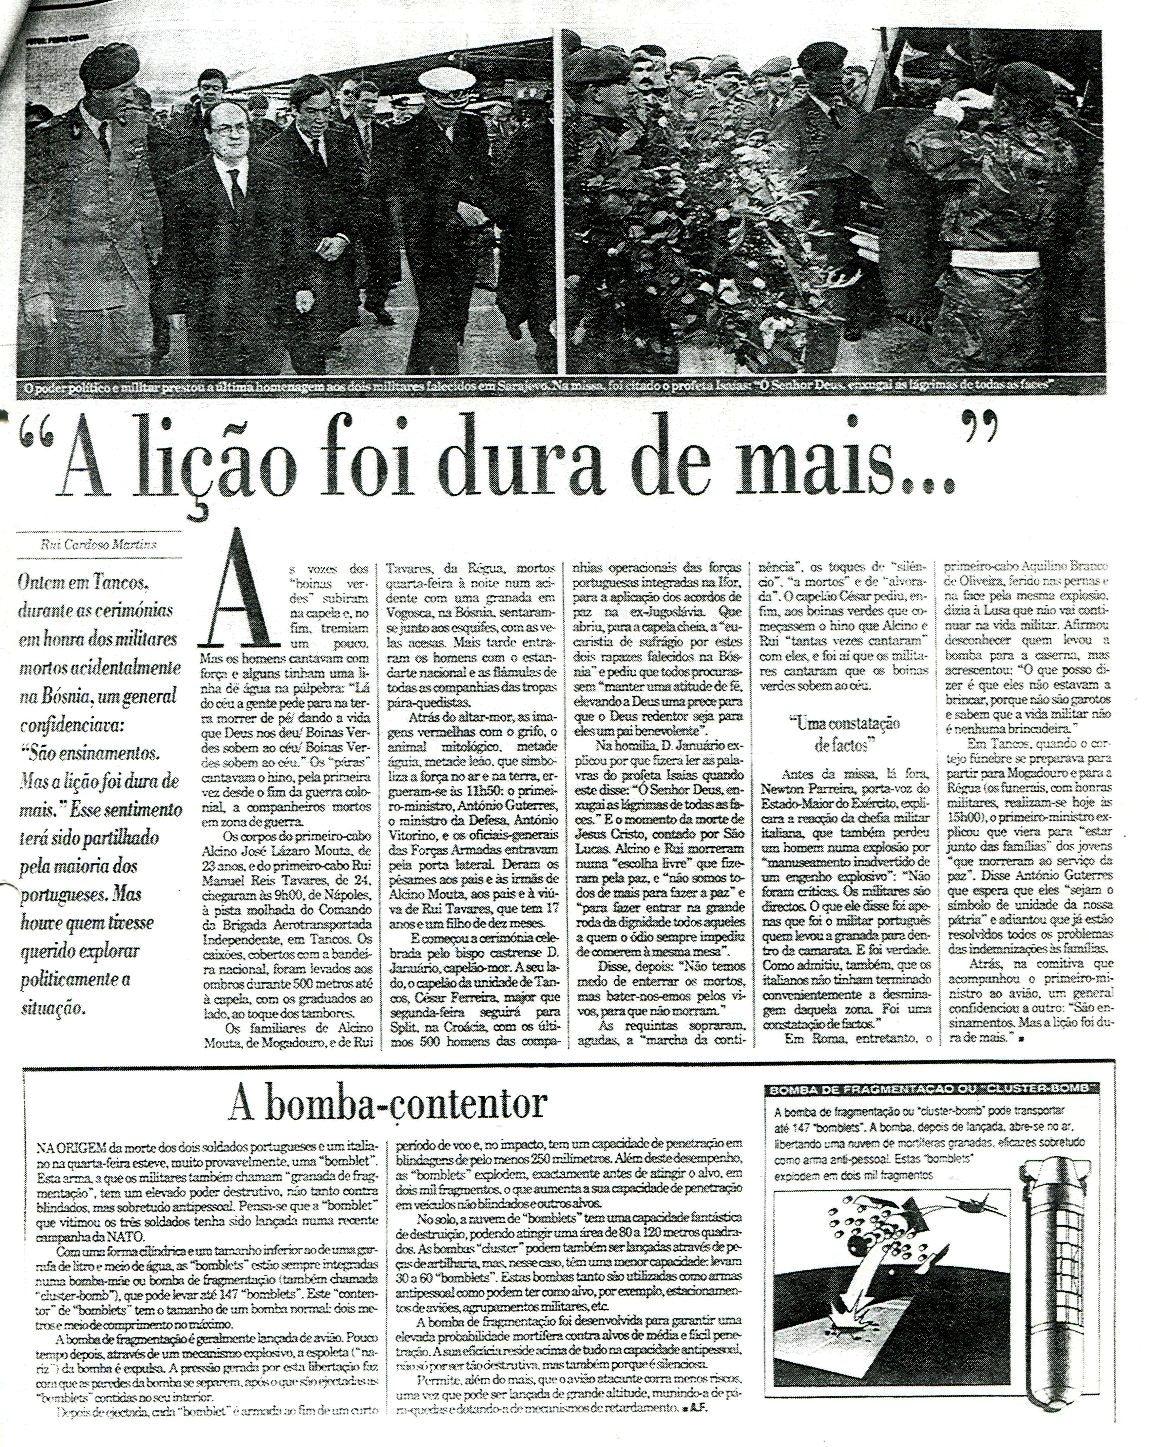 27JAN96 - Público